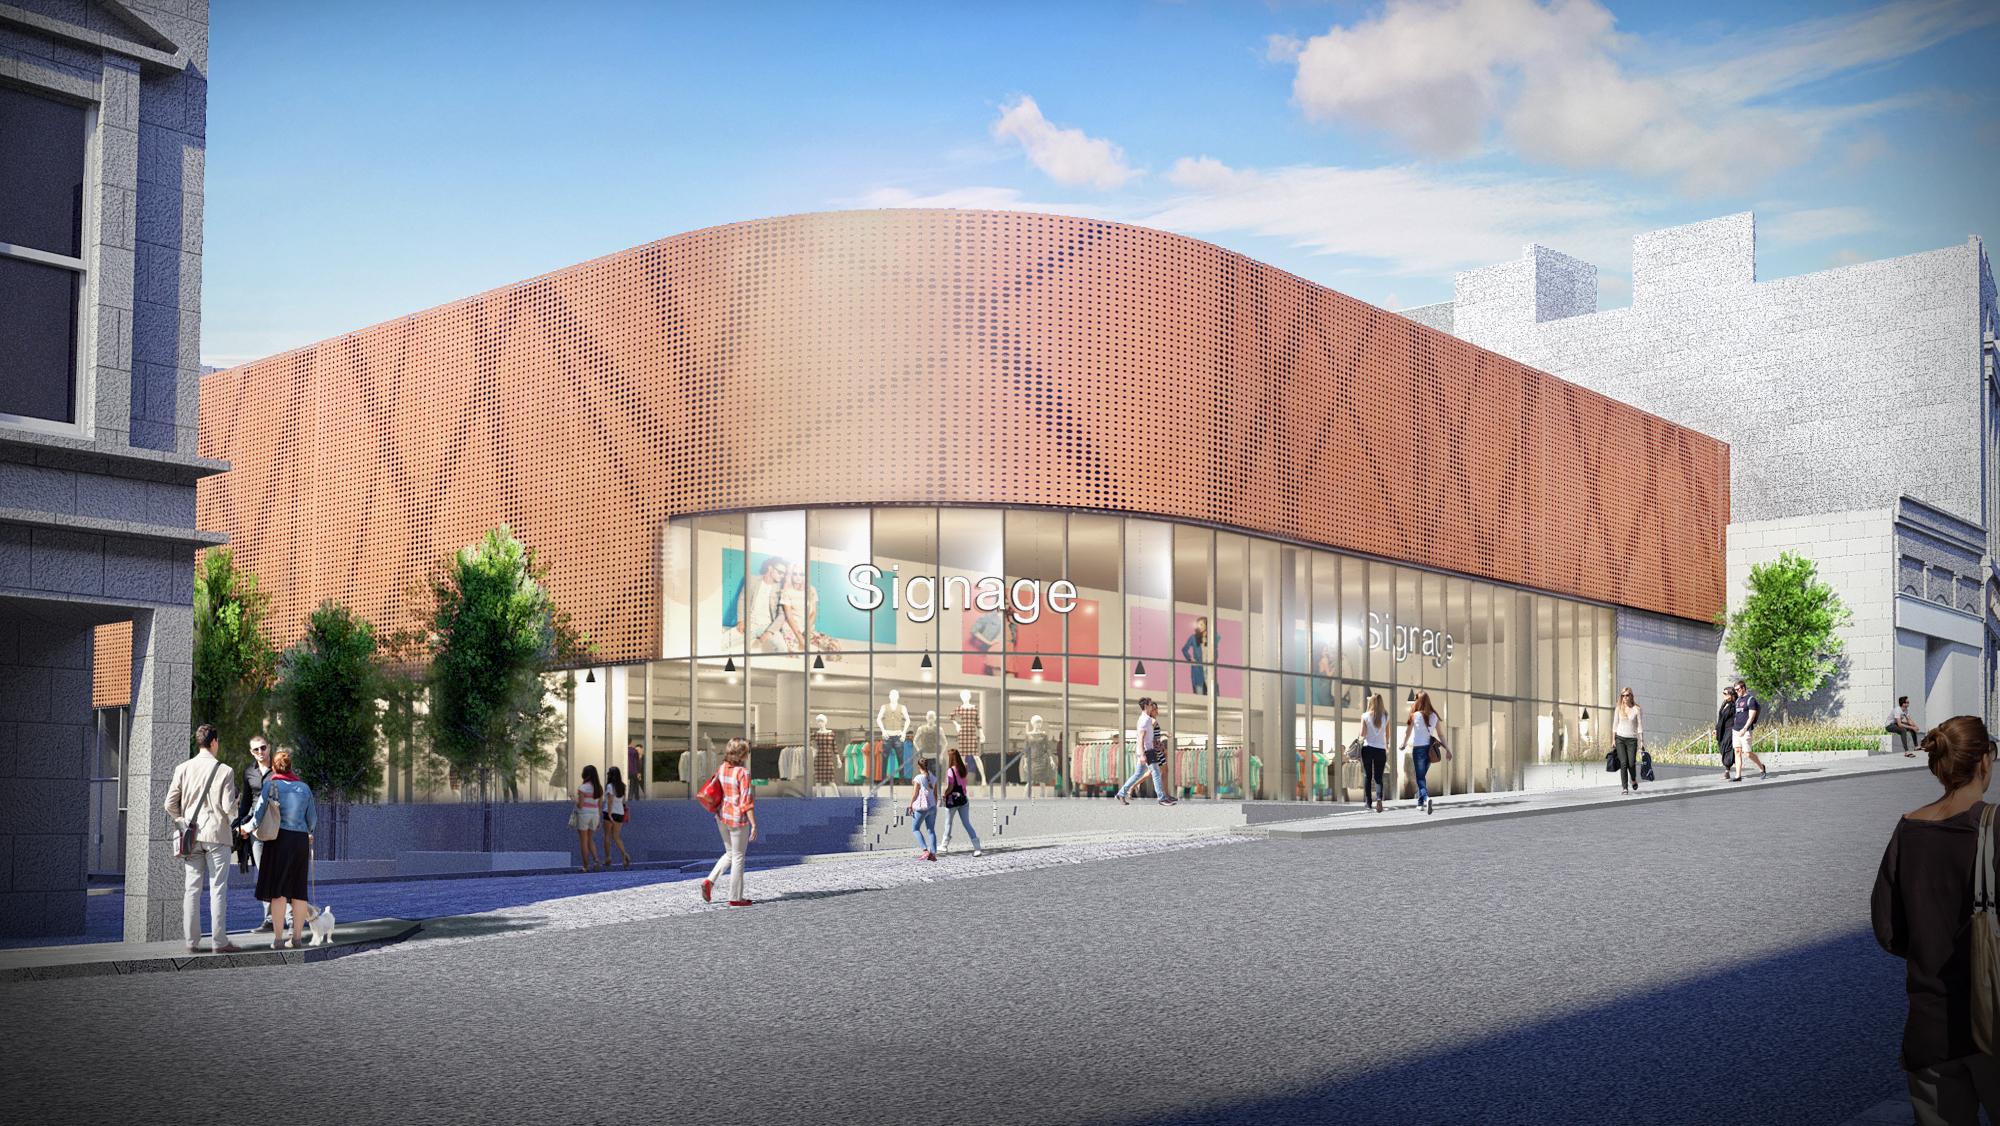 An artist's impression of Aberdeen's revamped indoor market.